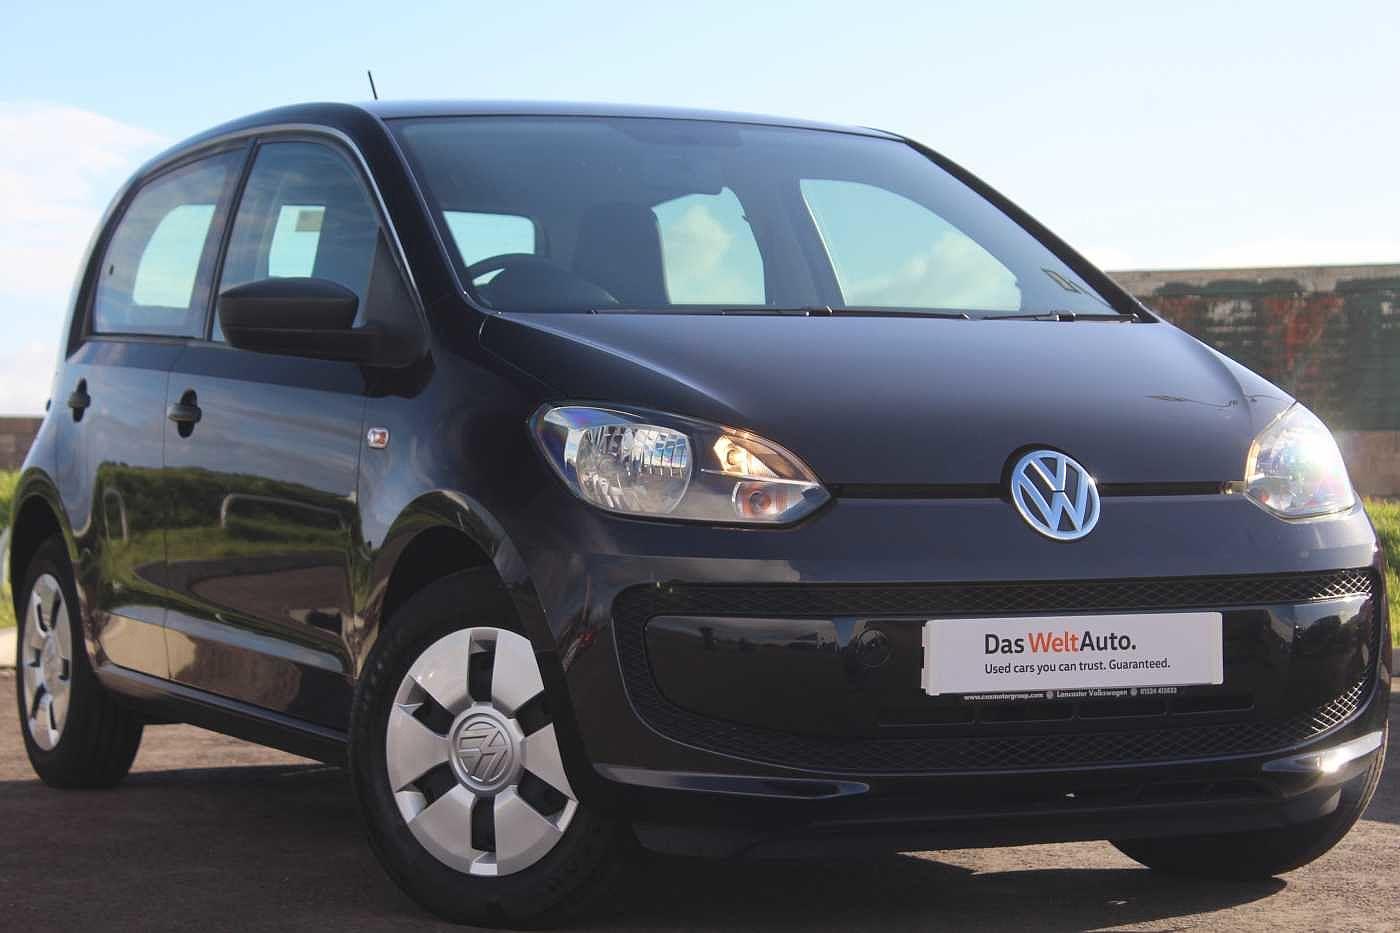 Volkswagen up! 1.0 (60ps) Take 5-Dr